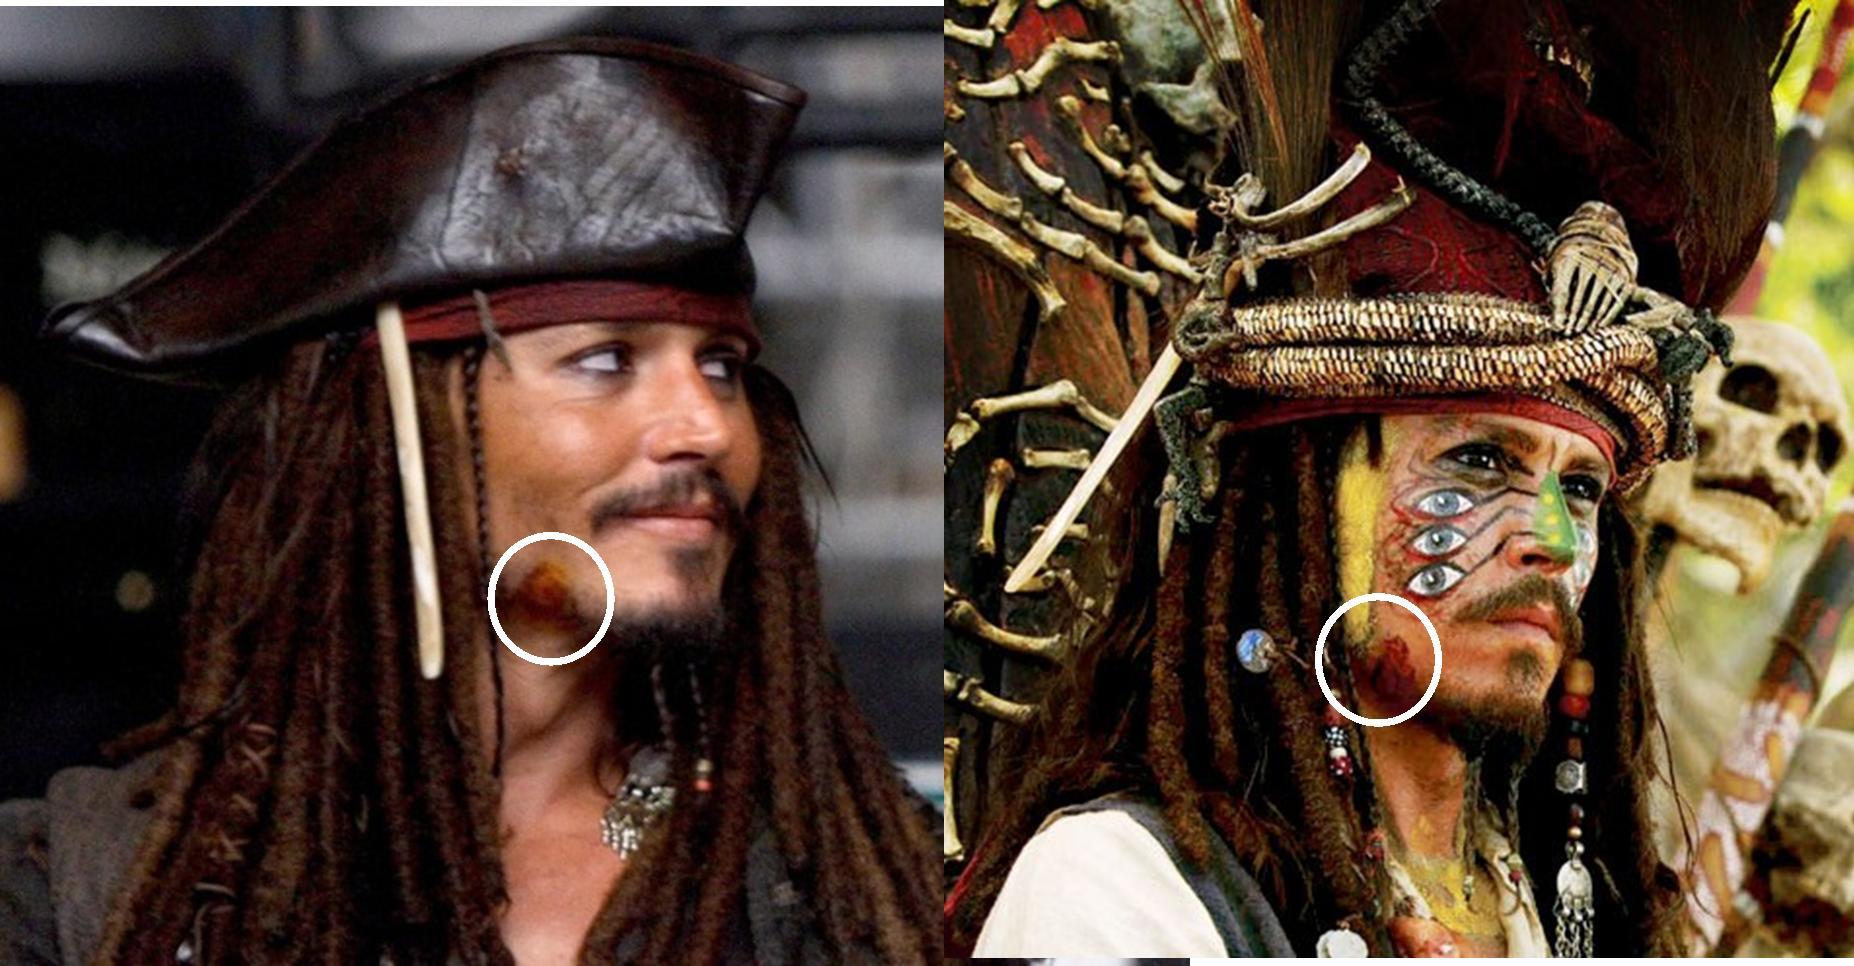 Surprising Jack Sparrow Costuming A Pirate39S Compendium Short Hairstyles For Black Women Fulllsitofus